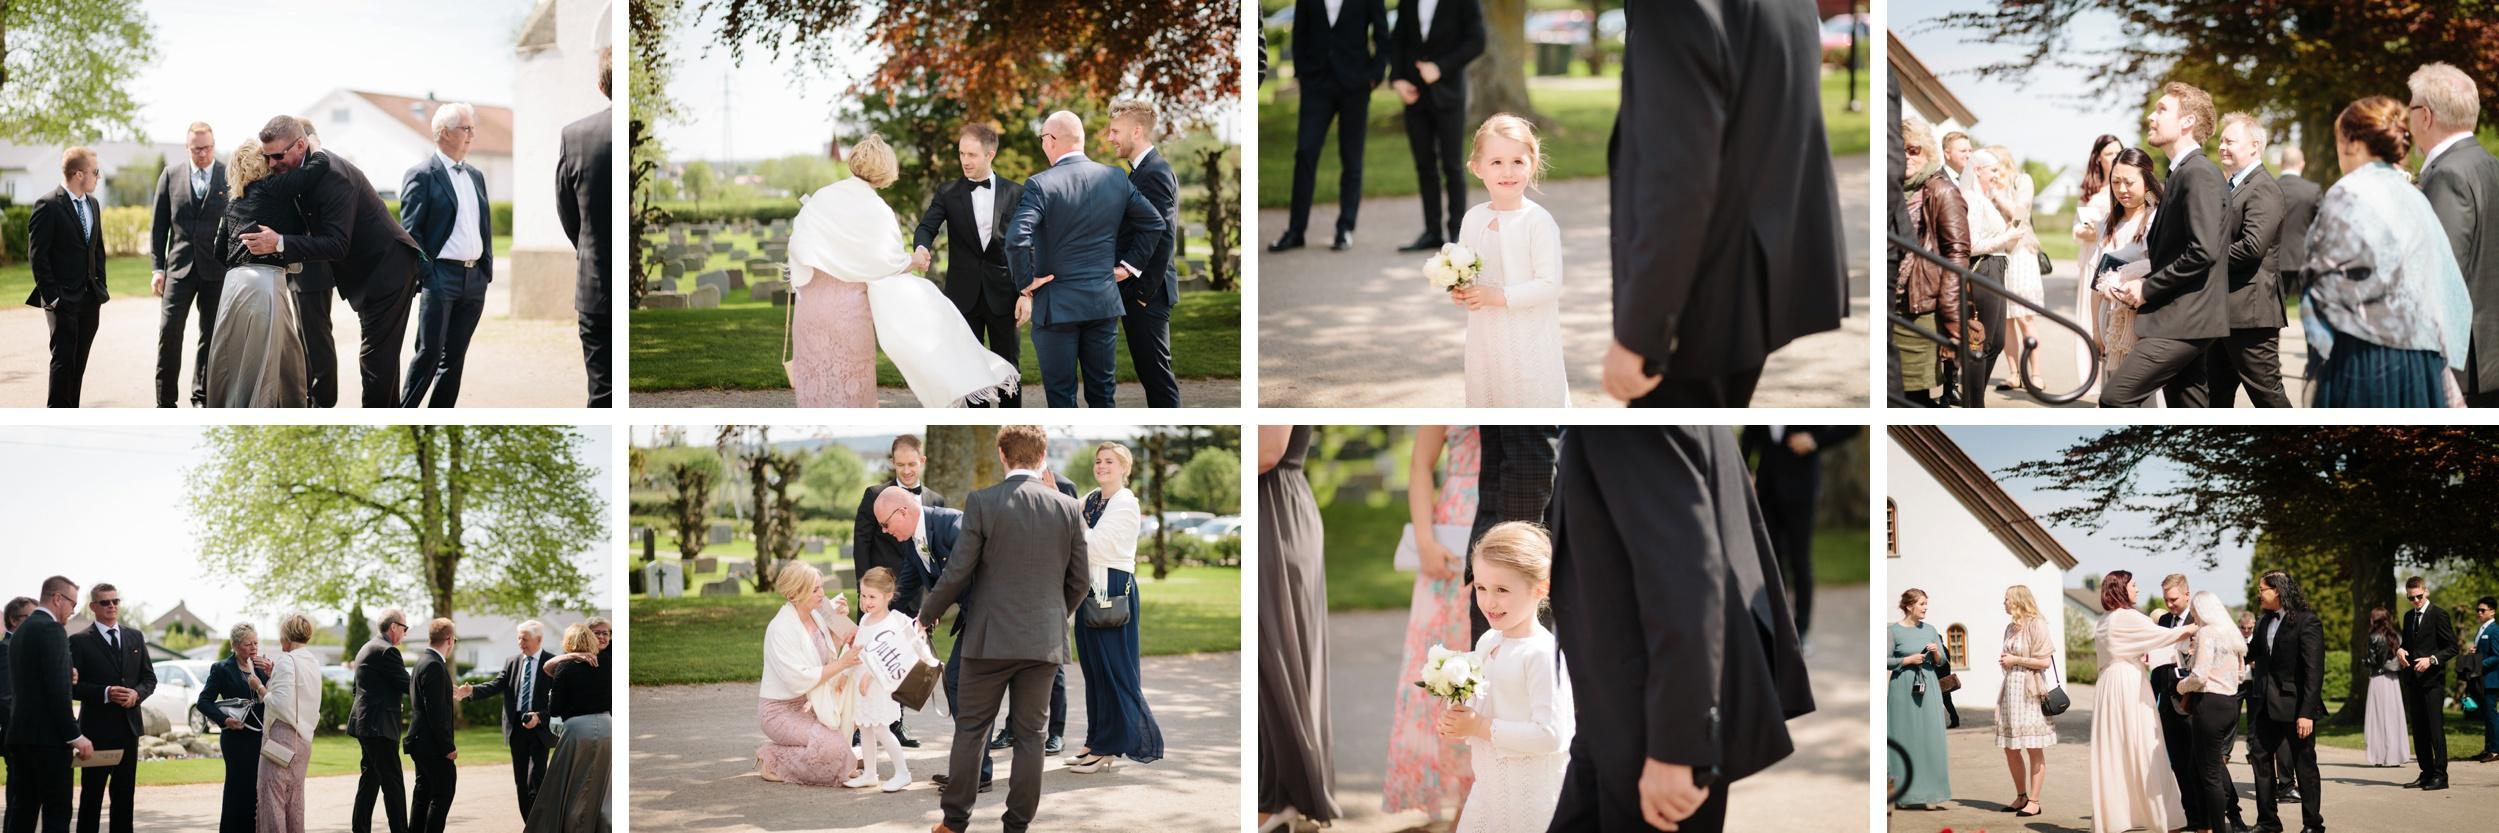 bryllup-bryllupsfotografering-bryllupsfotograf-sarpsborg-20170520-_MG_8487Camilla-og-ruben_WEB.jpg